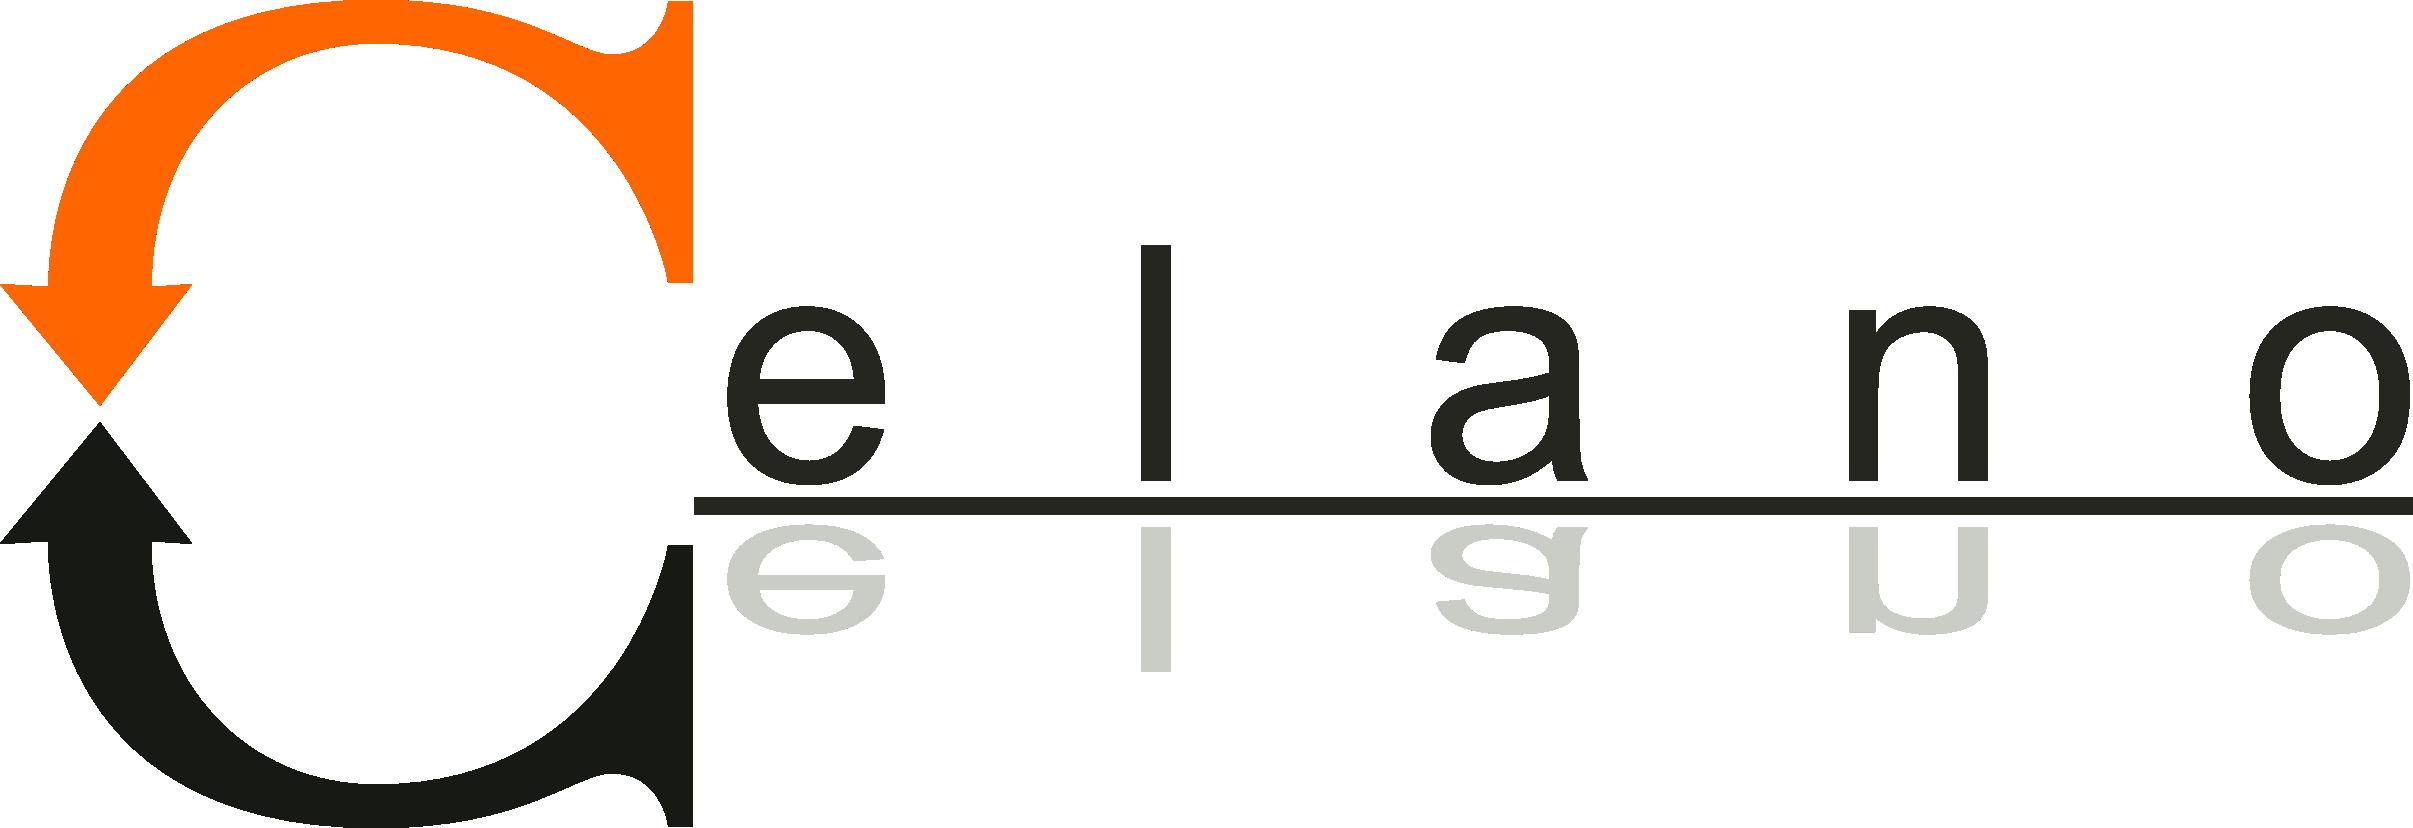 celano-logo